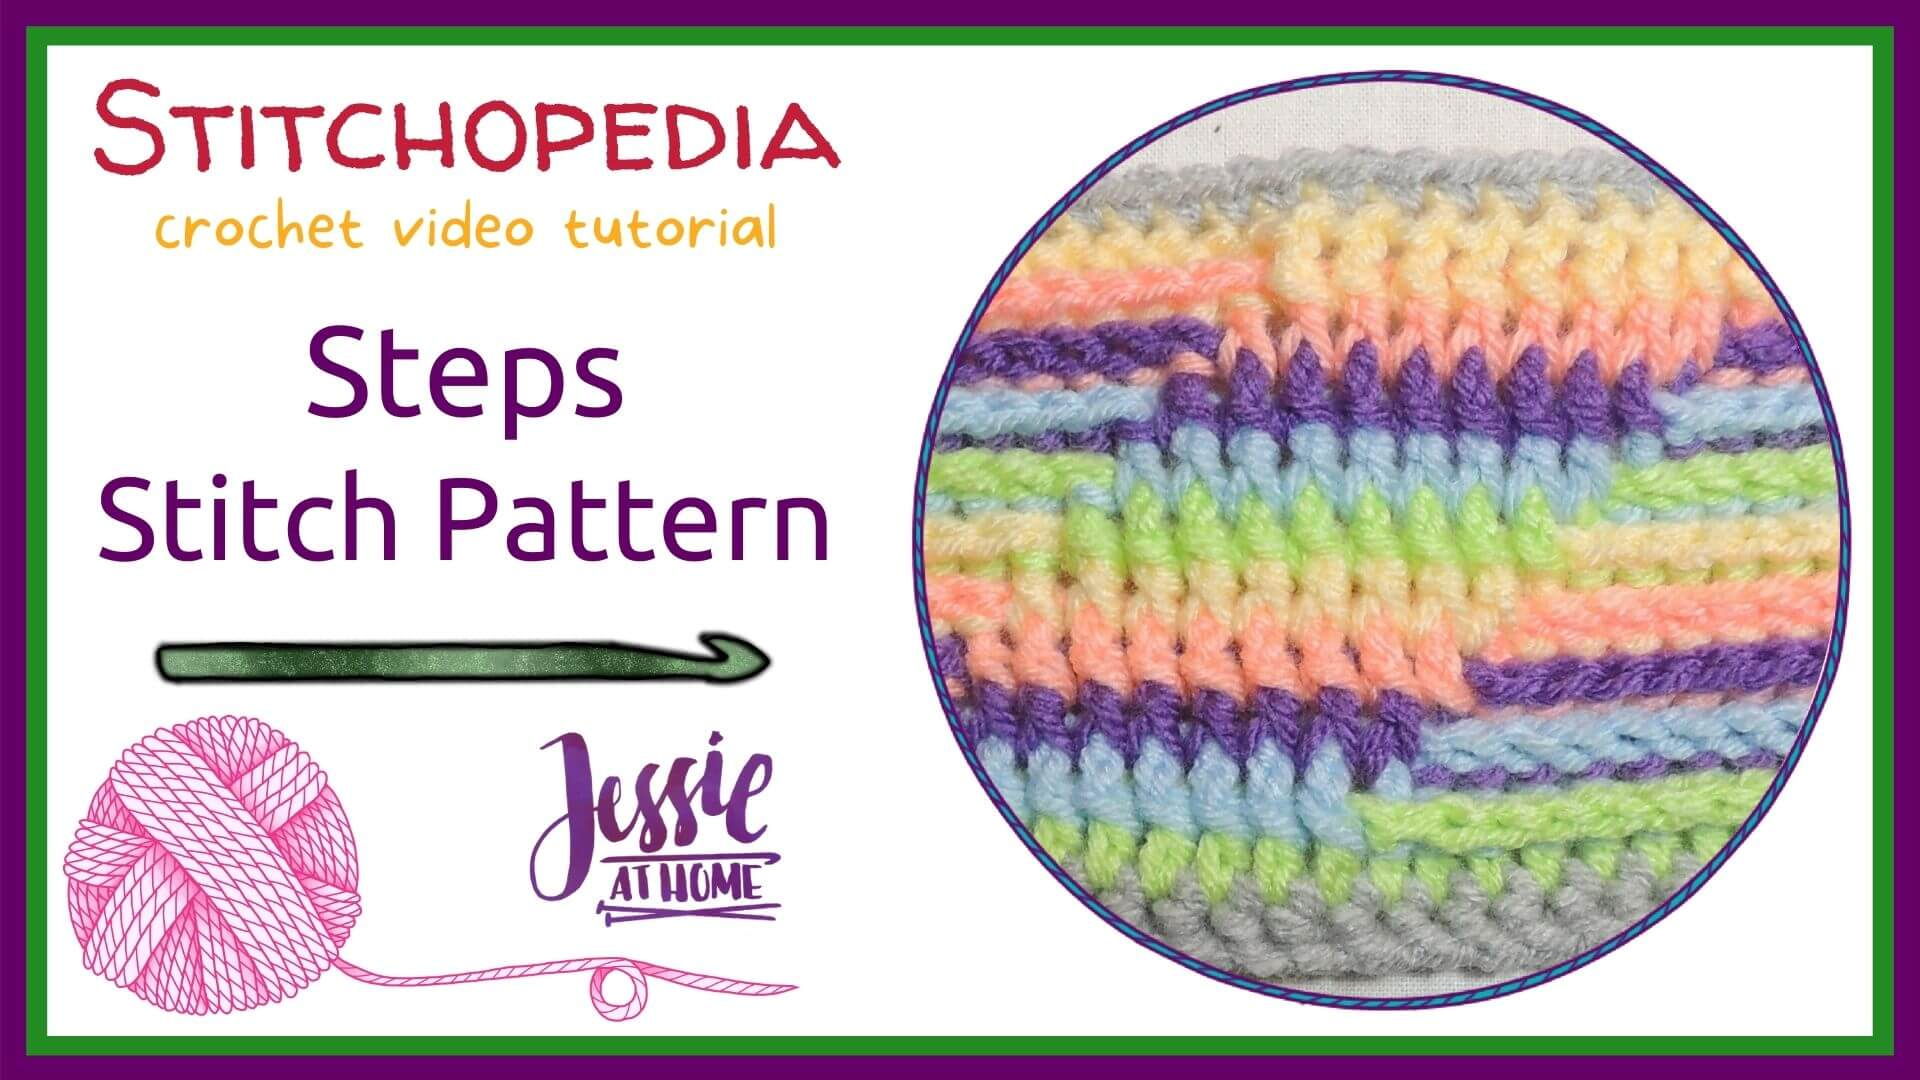 Steps Stitch Pattern - Stitchopedia Crochet Video Tutorial by Jessie At Home - Cover